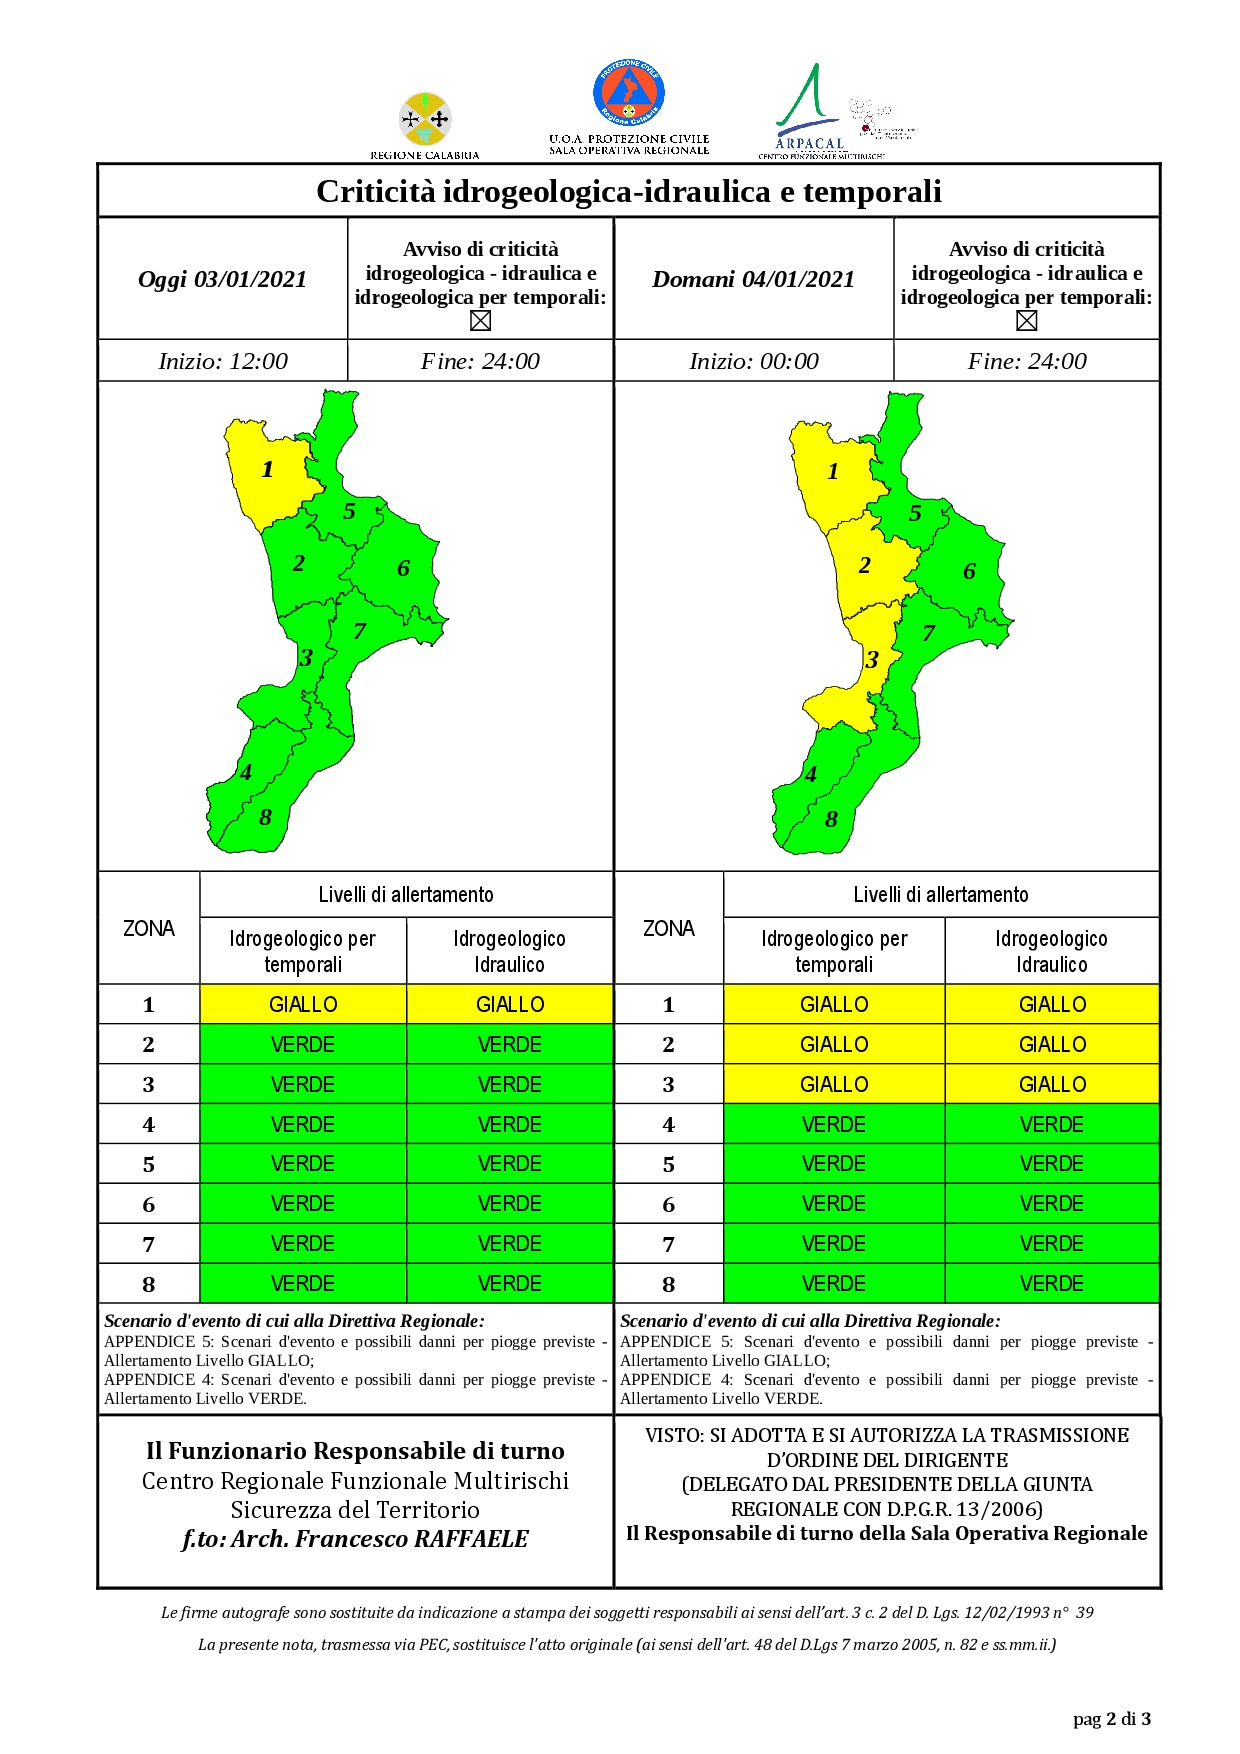 Criticità idrogeologica-idraulica e temporali in Calabria 03-01-2021